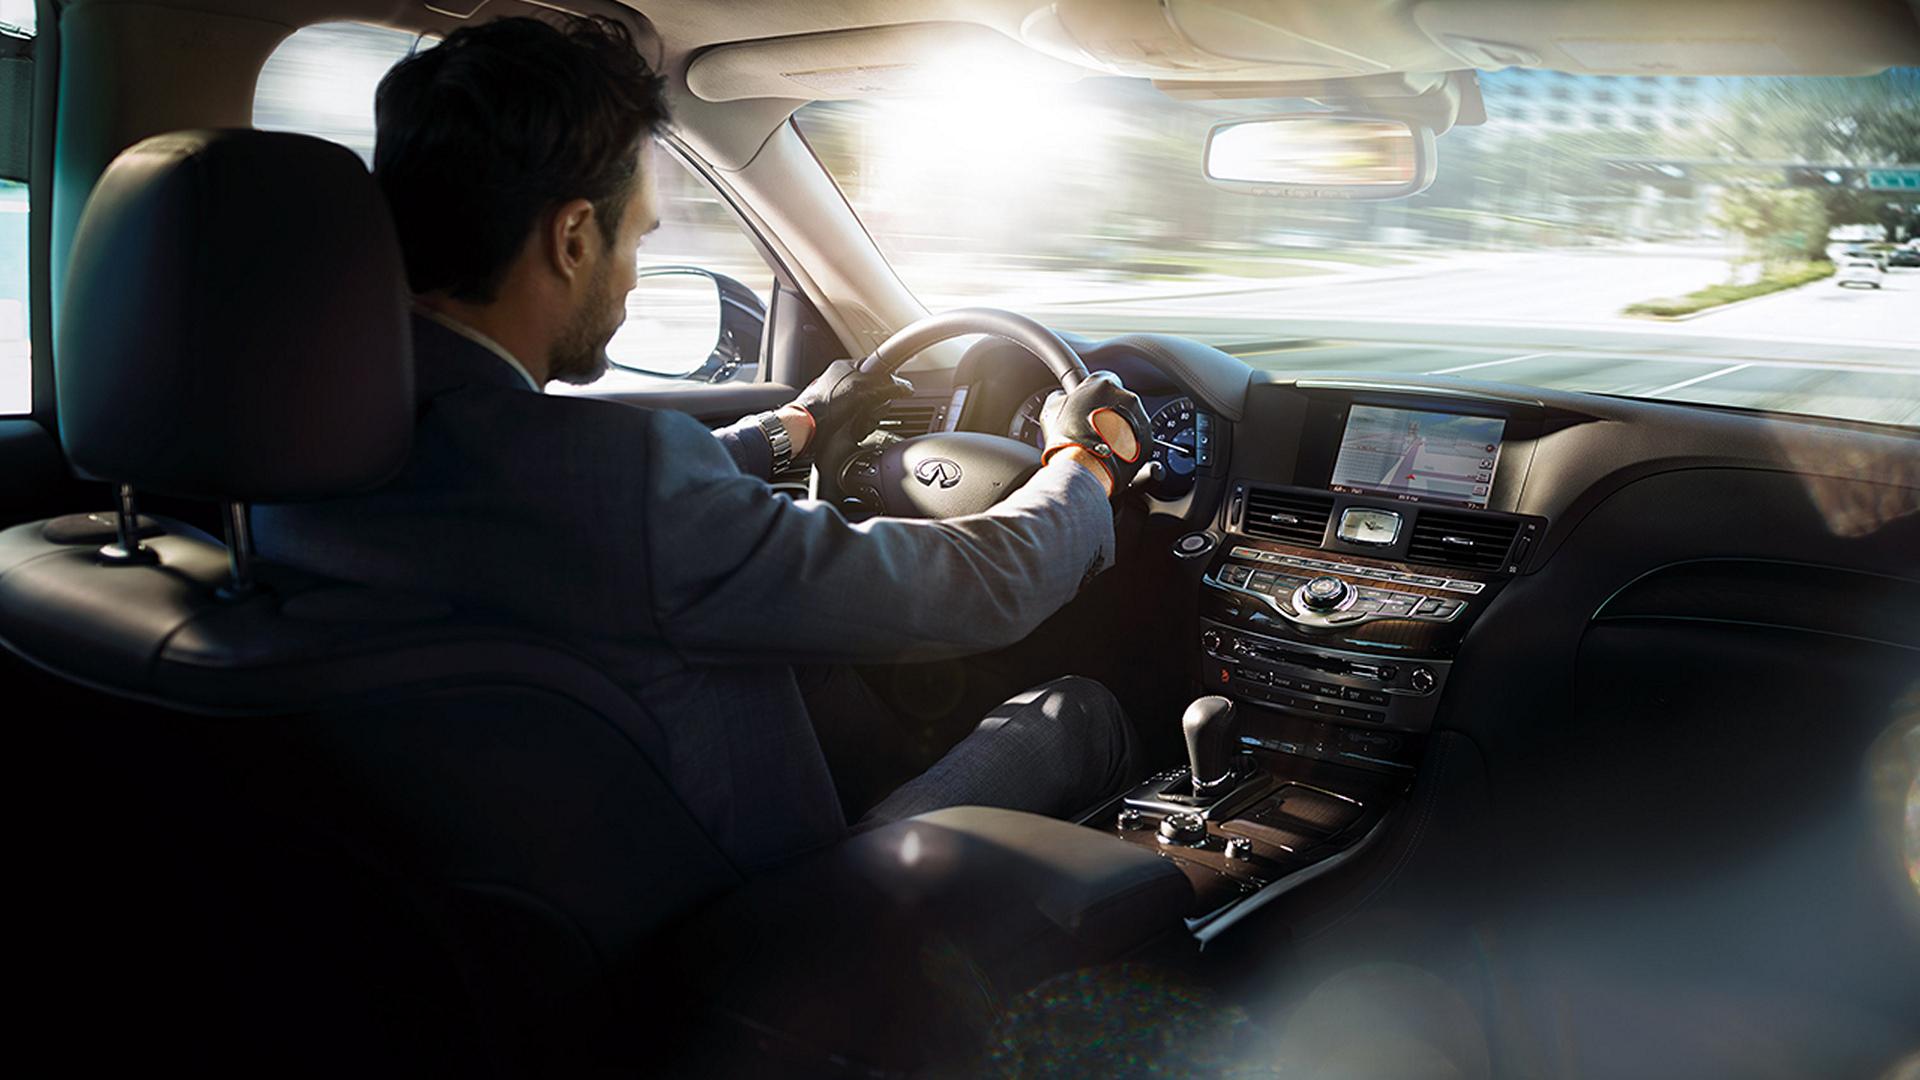 2016 Infiniti Q70 Hybrid © Nissan Motor Co., Ltd.